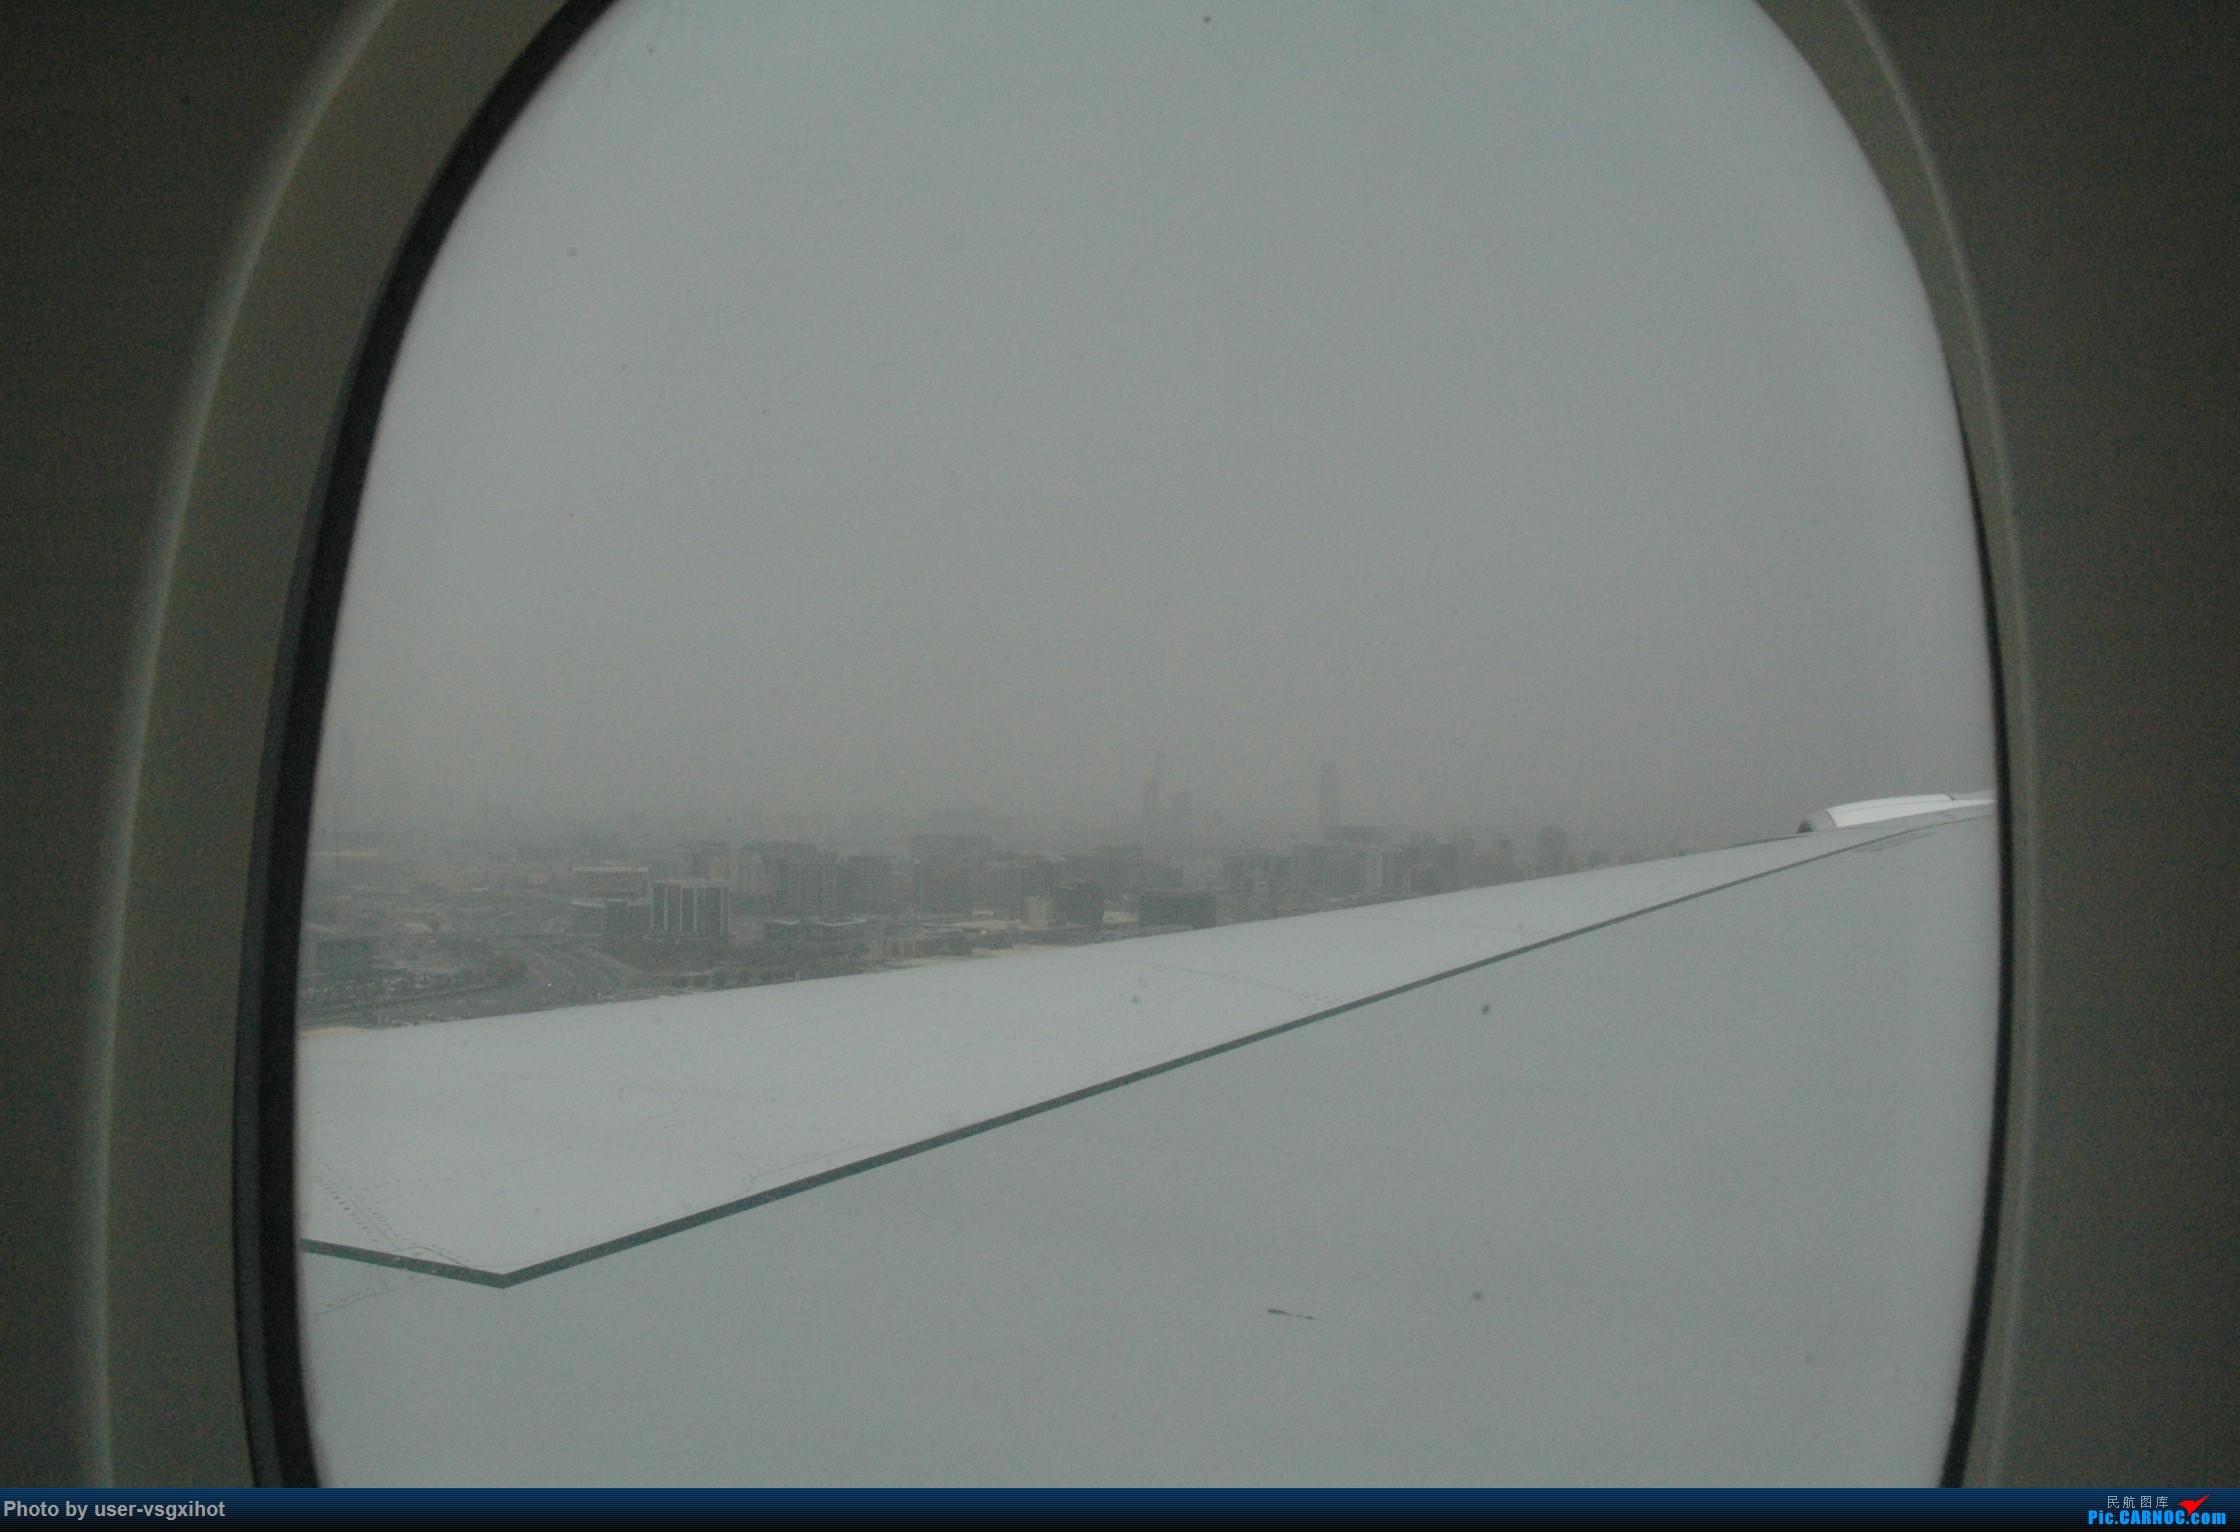 Re:[原创]【Hans游记(6)出埃及记】(PART 1)经阿航转机初识埃及,40度高温下の开罗一日游 AIRBUS A380-800  空中